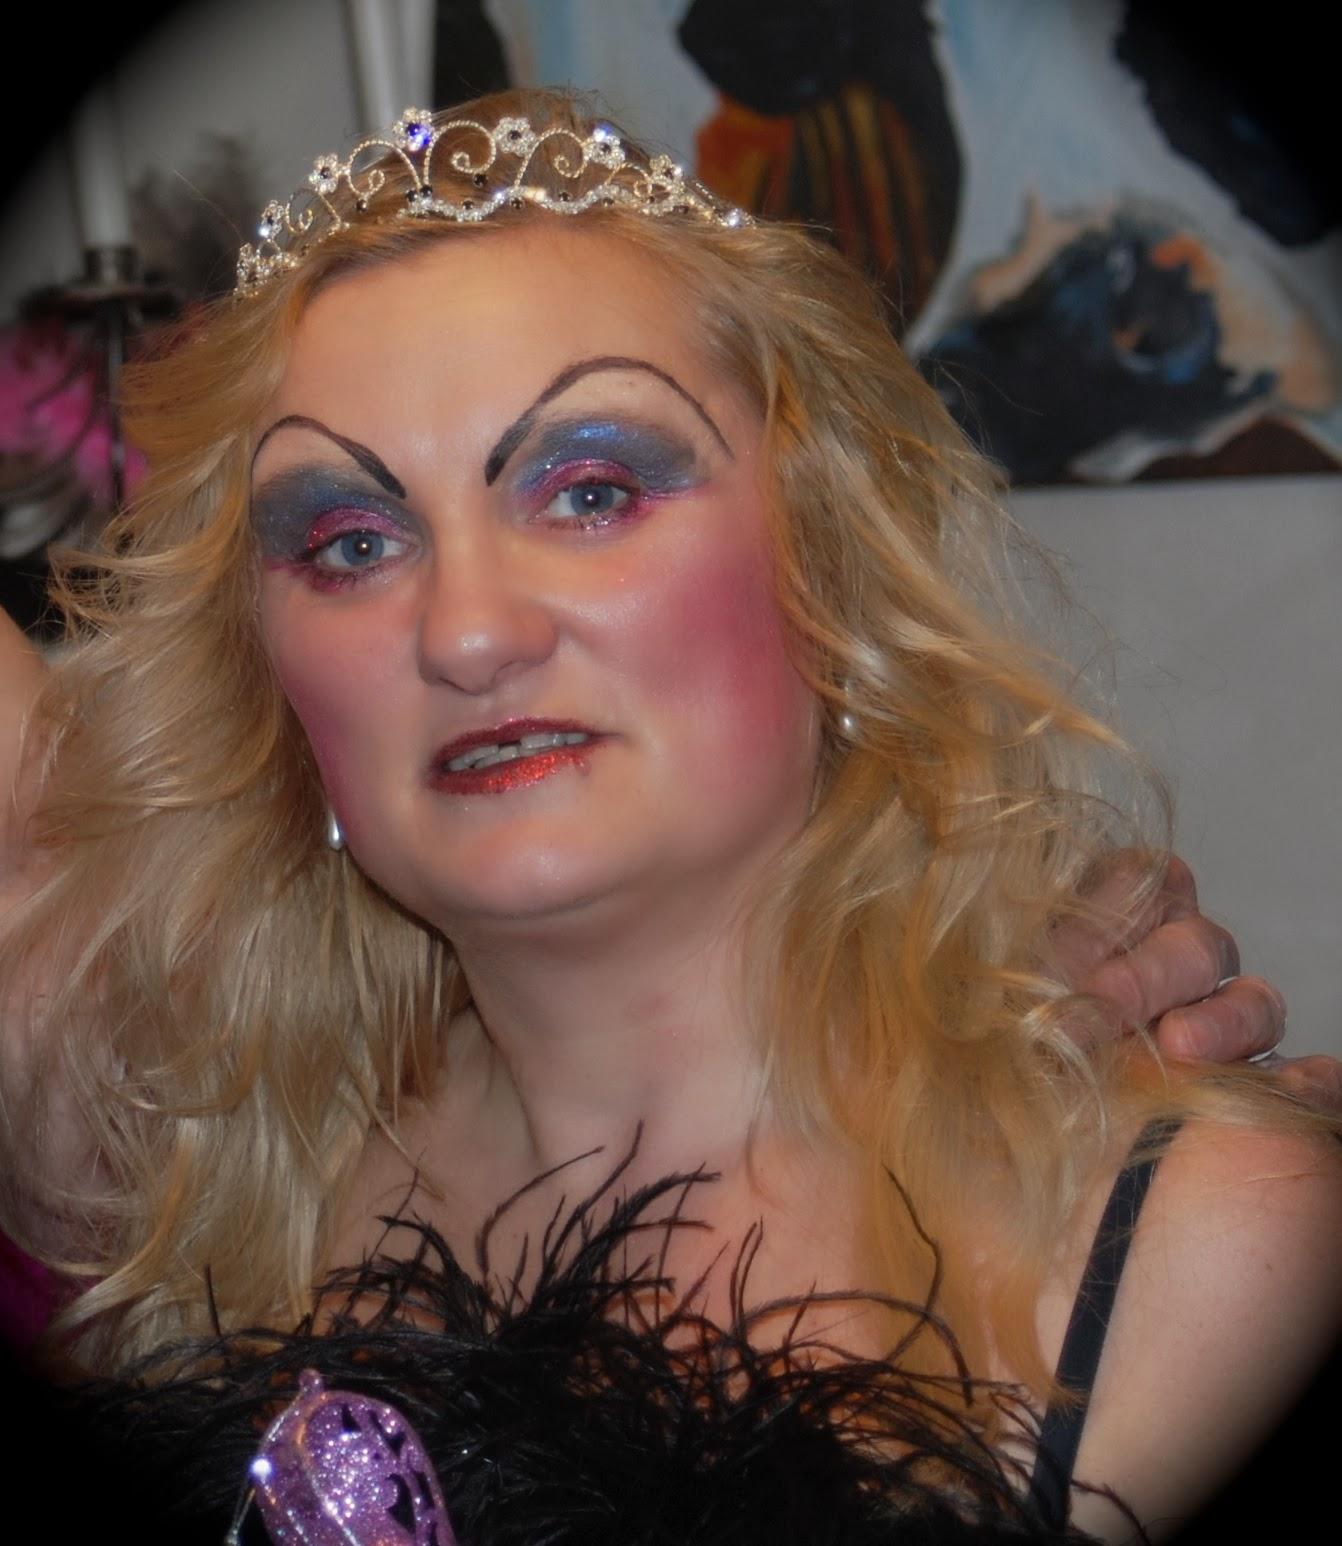 blogger in drag queen costume